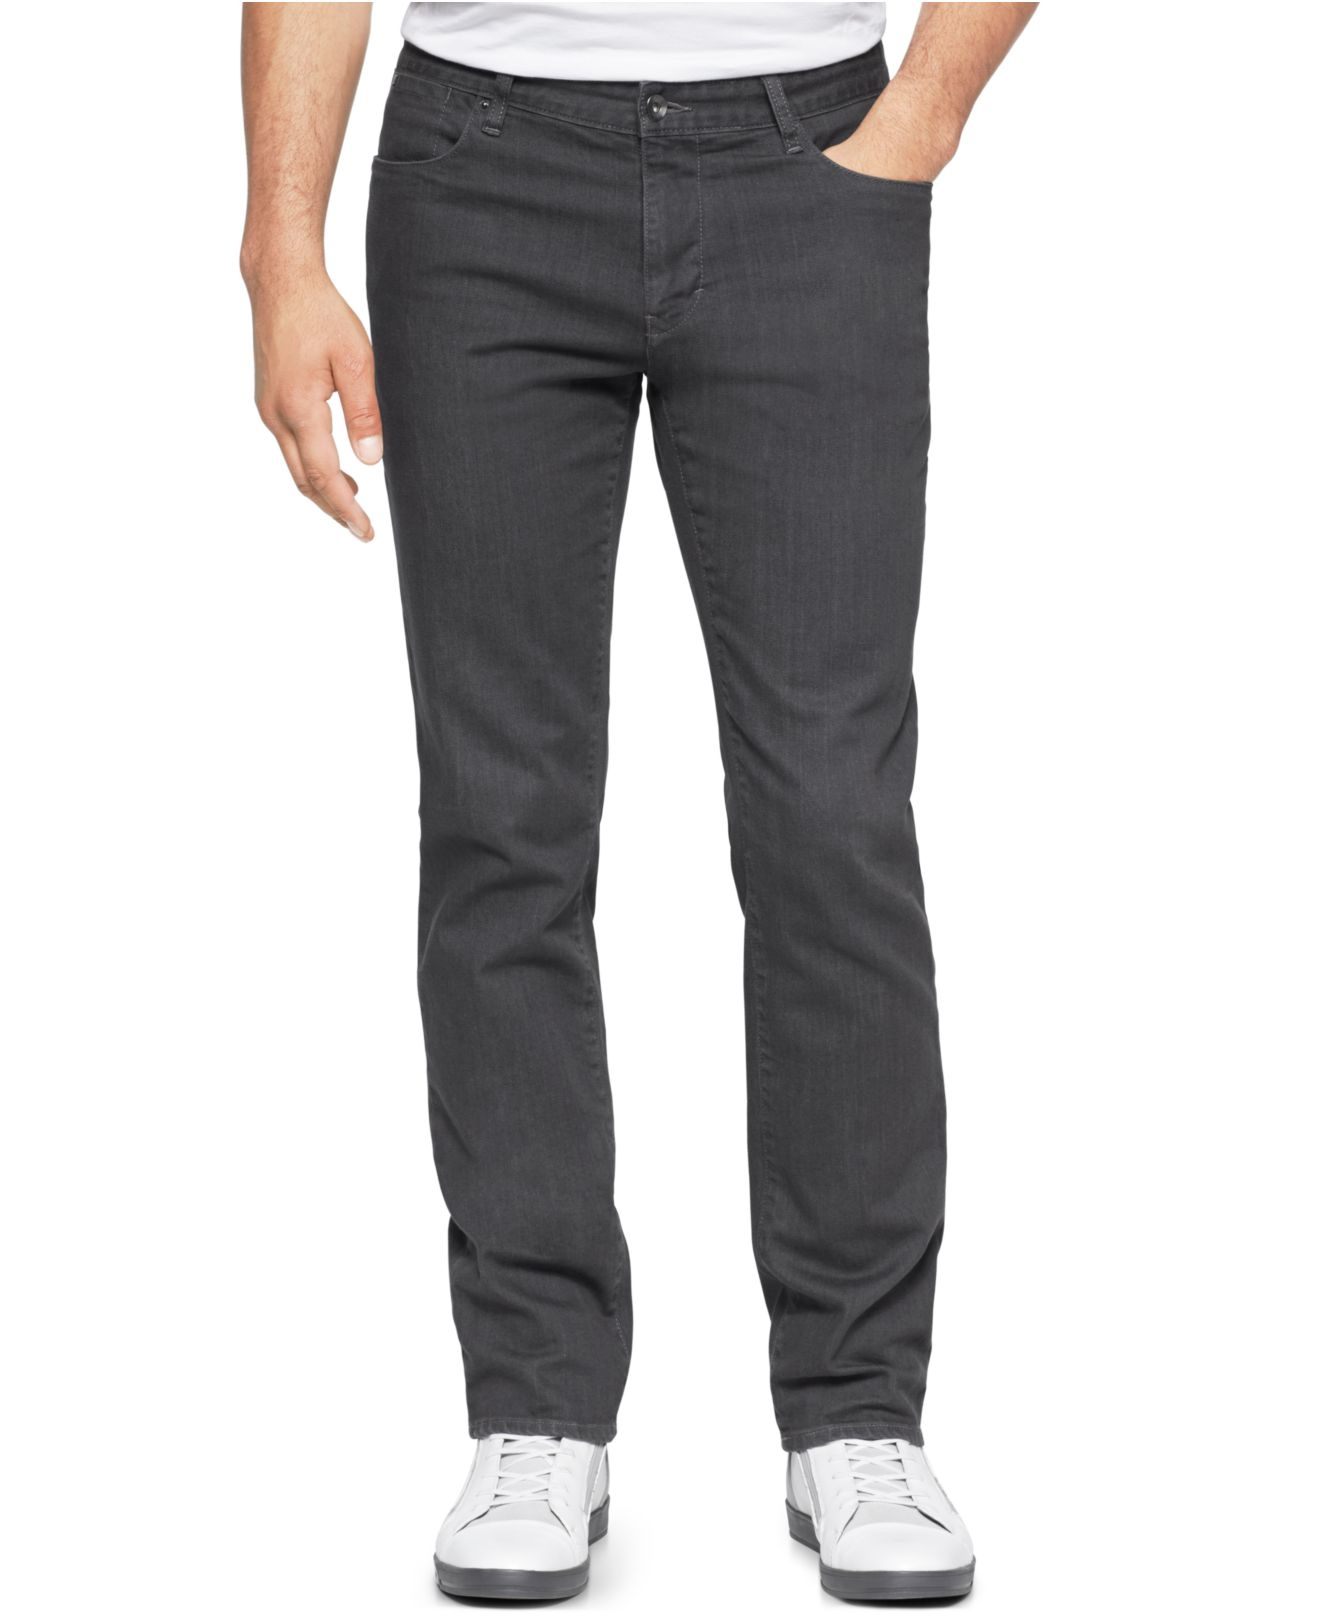 Calvin klein 5-pocket Grey Slim Fit Straight Leg Pants in ...